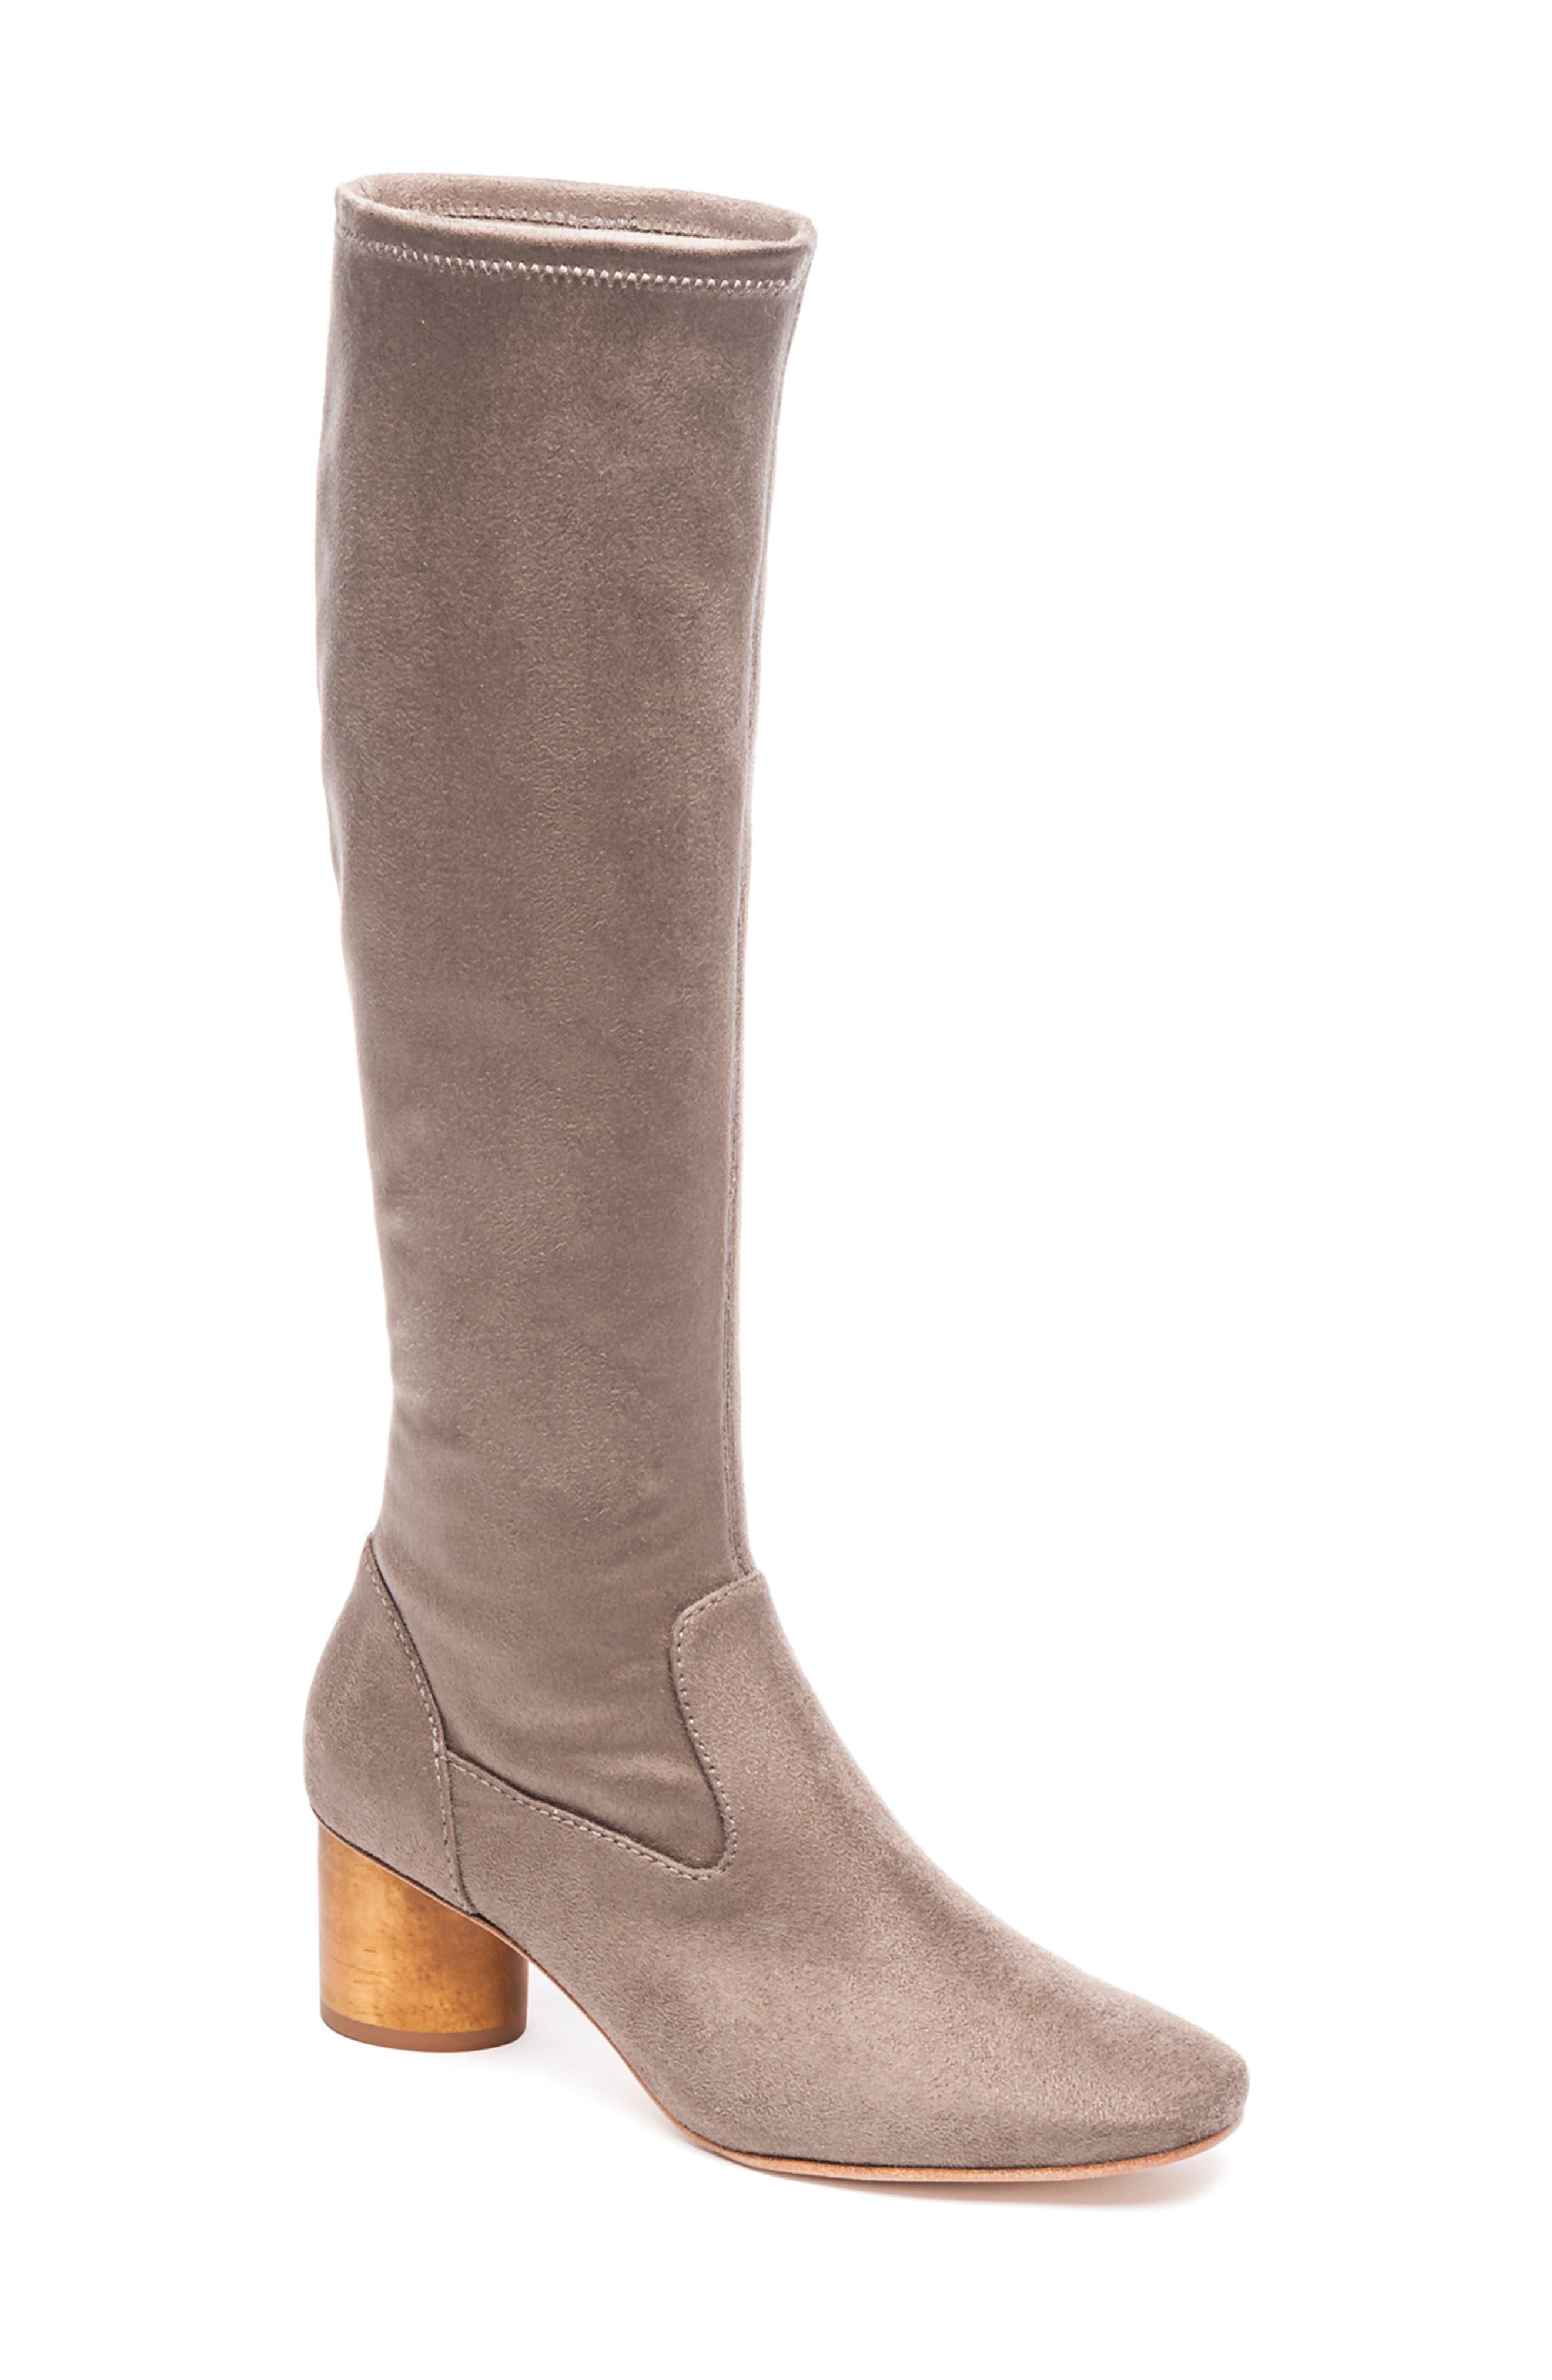 Bernardo Knee High Boot- Beige